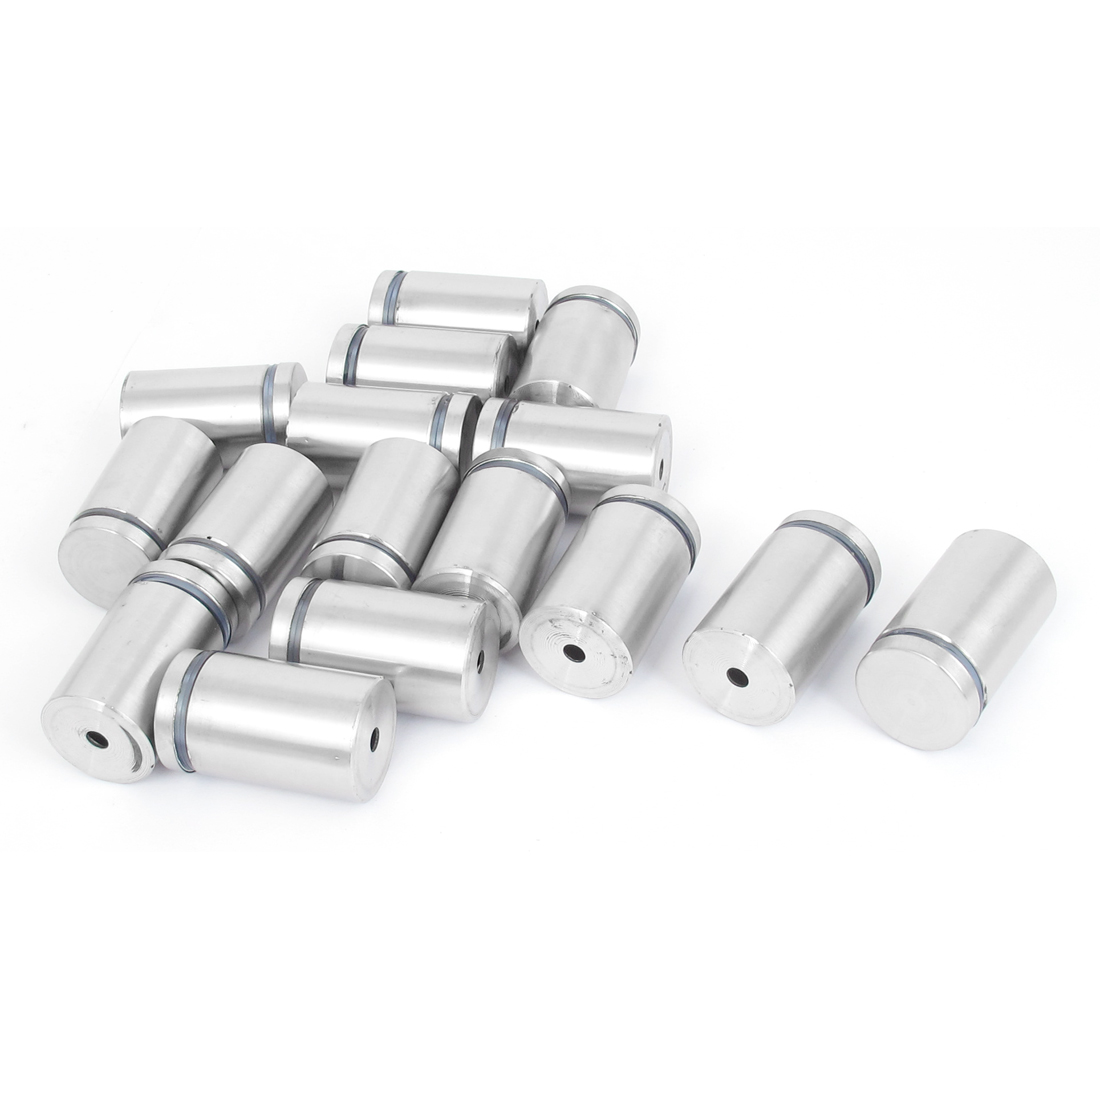 25mm x 40mm Stainless Steel Advertising Frameless Glass Standoff Pins 16pcs